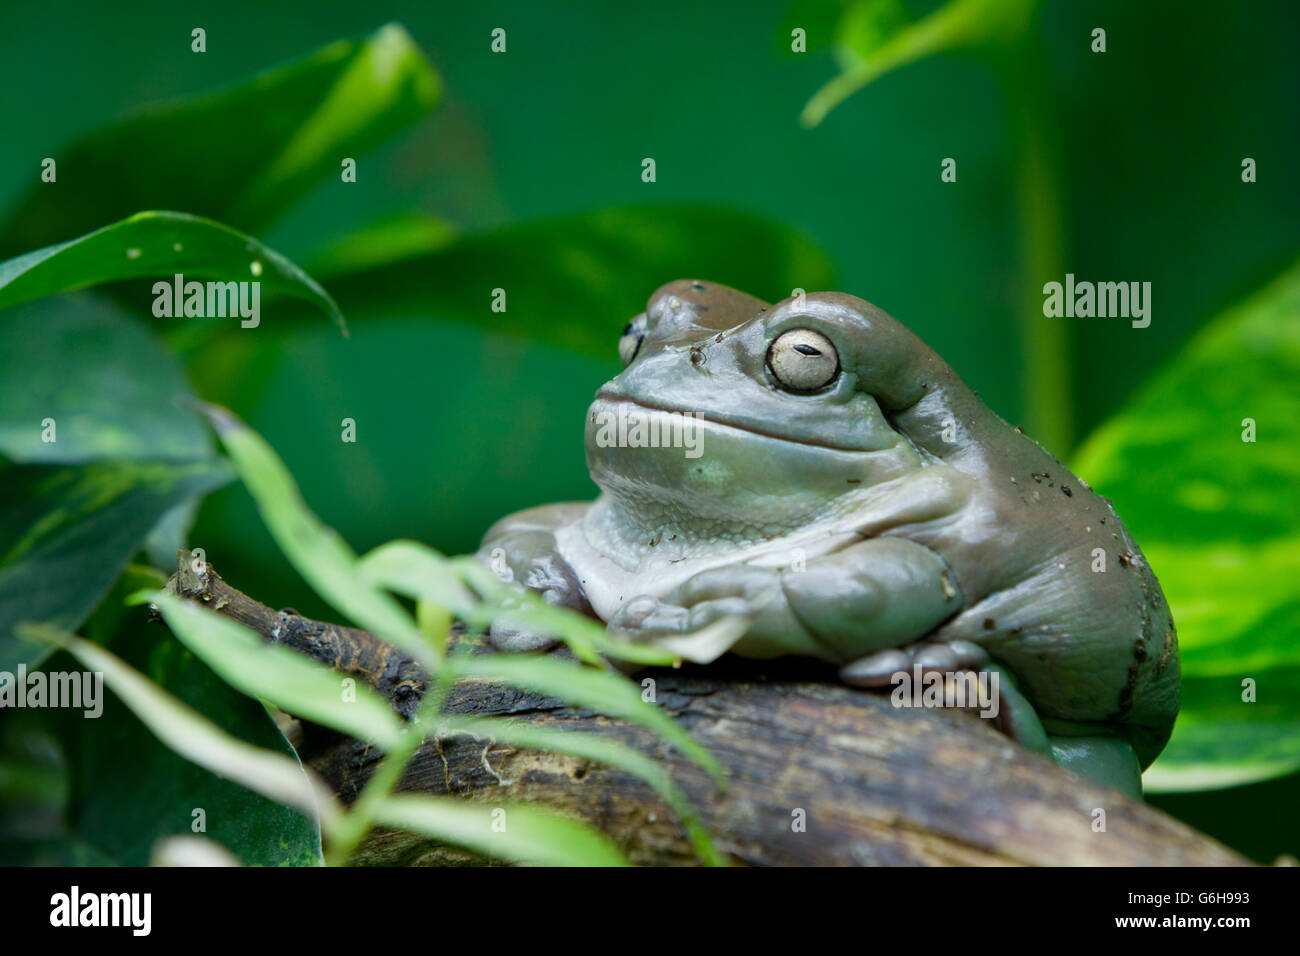 Makifrosch, Makifrog - Stock Image